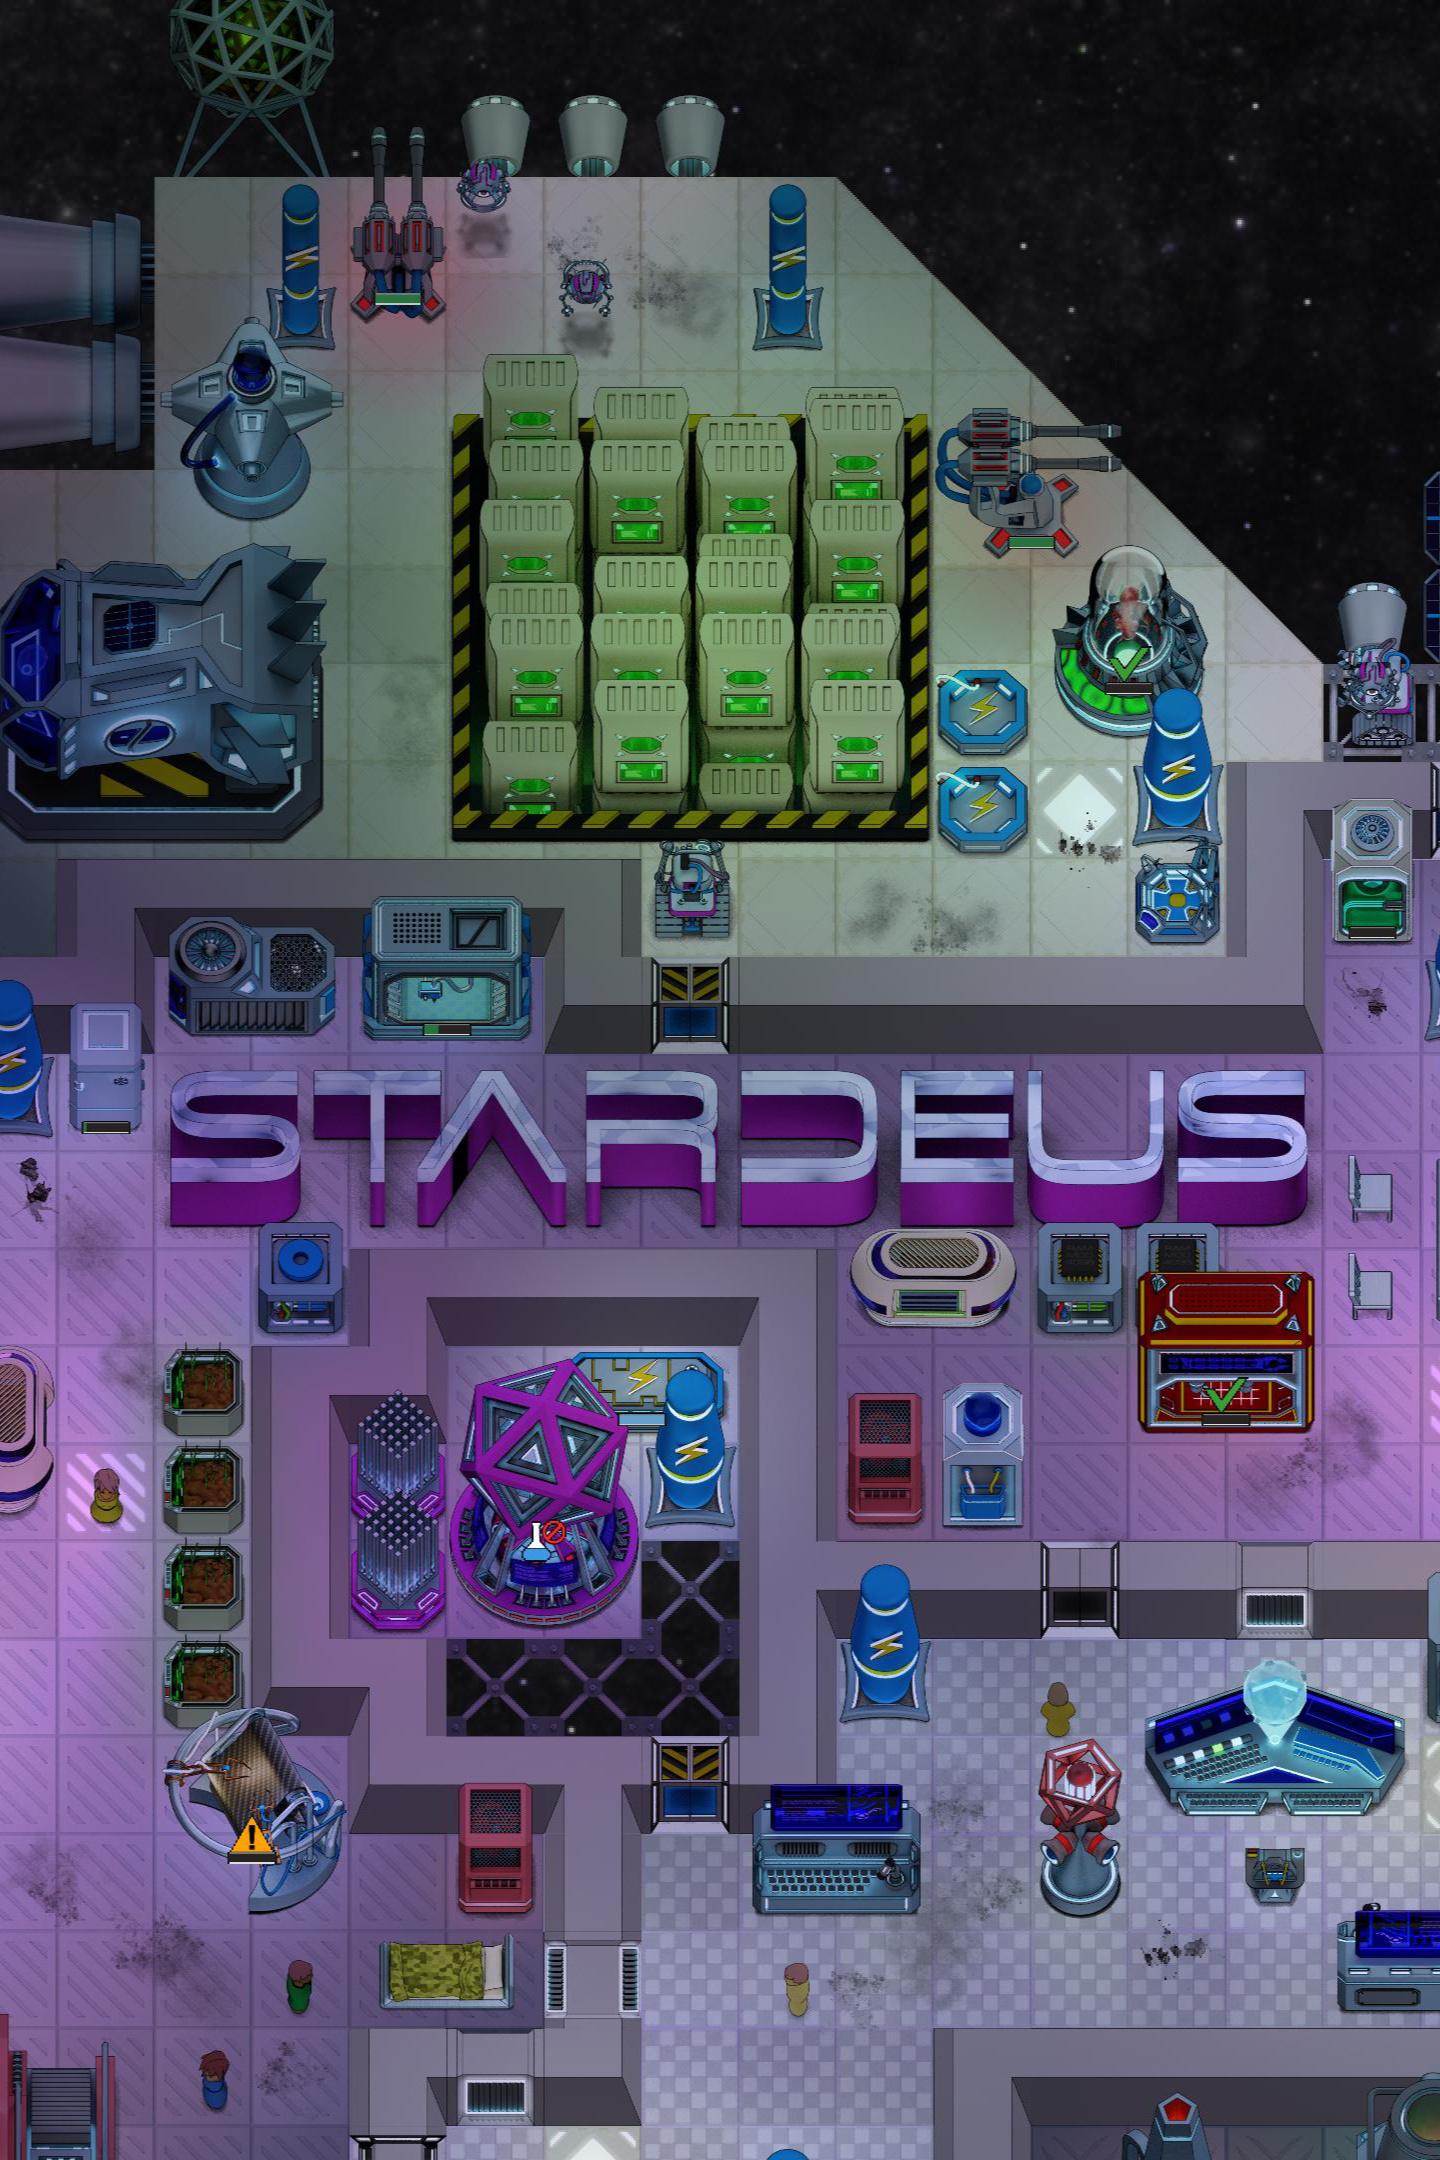 StardeusCoverVerticalHighres.jpg